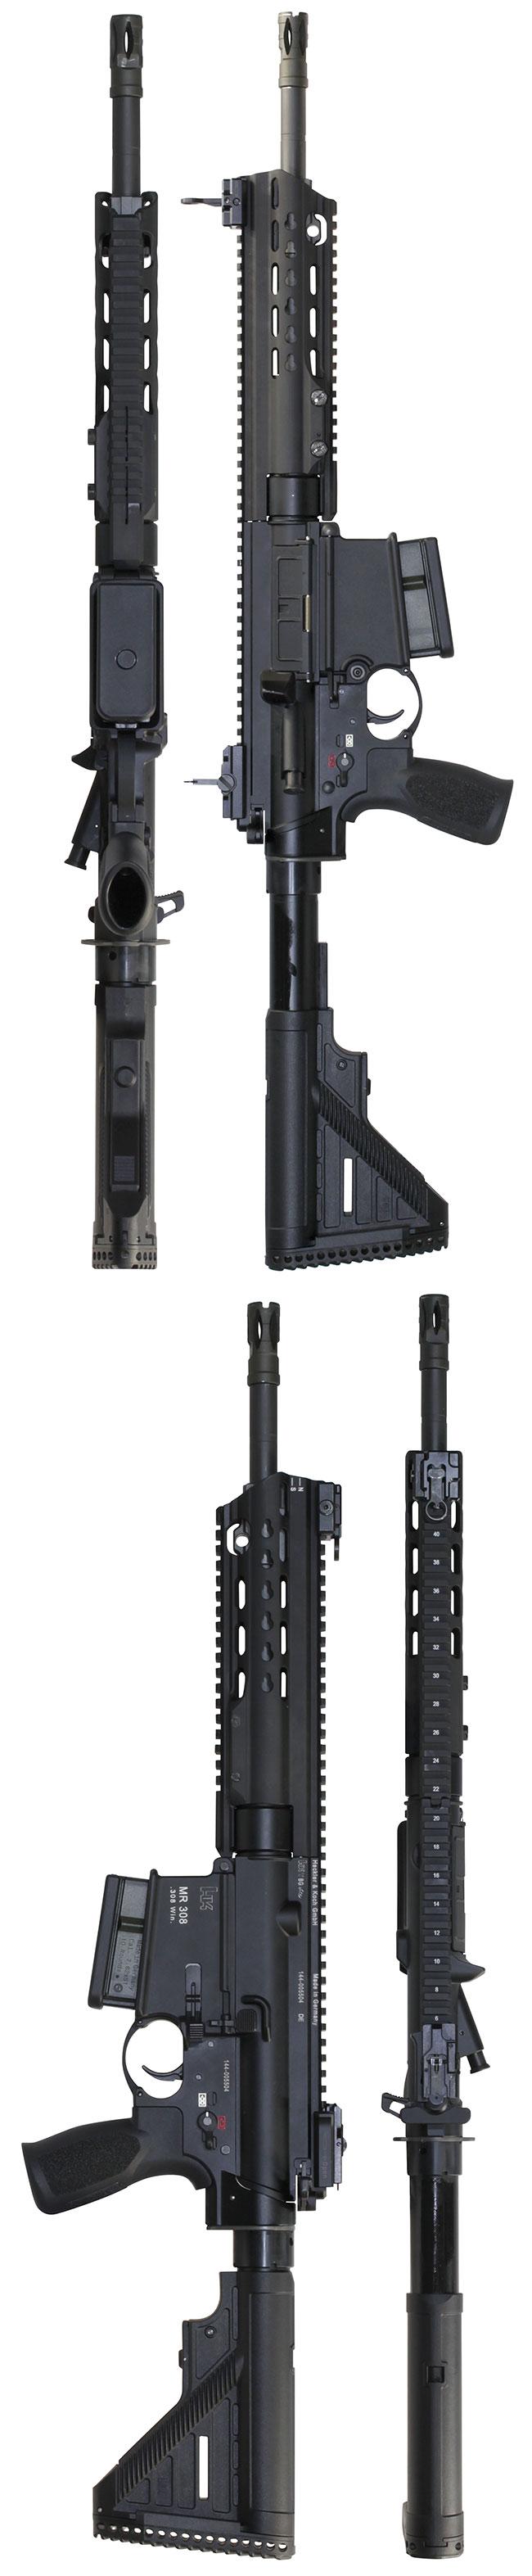 【5353】-HK-MR308A3-13インチモデル-(#144-005504)---右.jpg